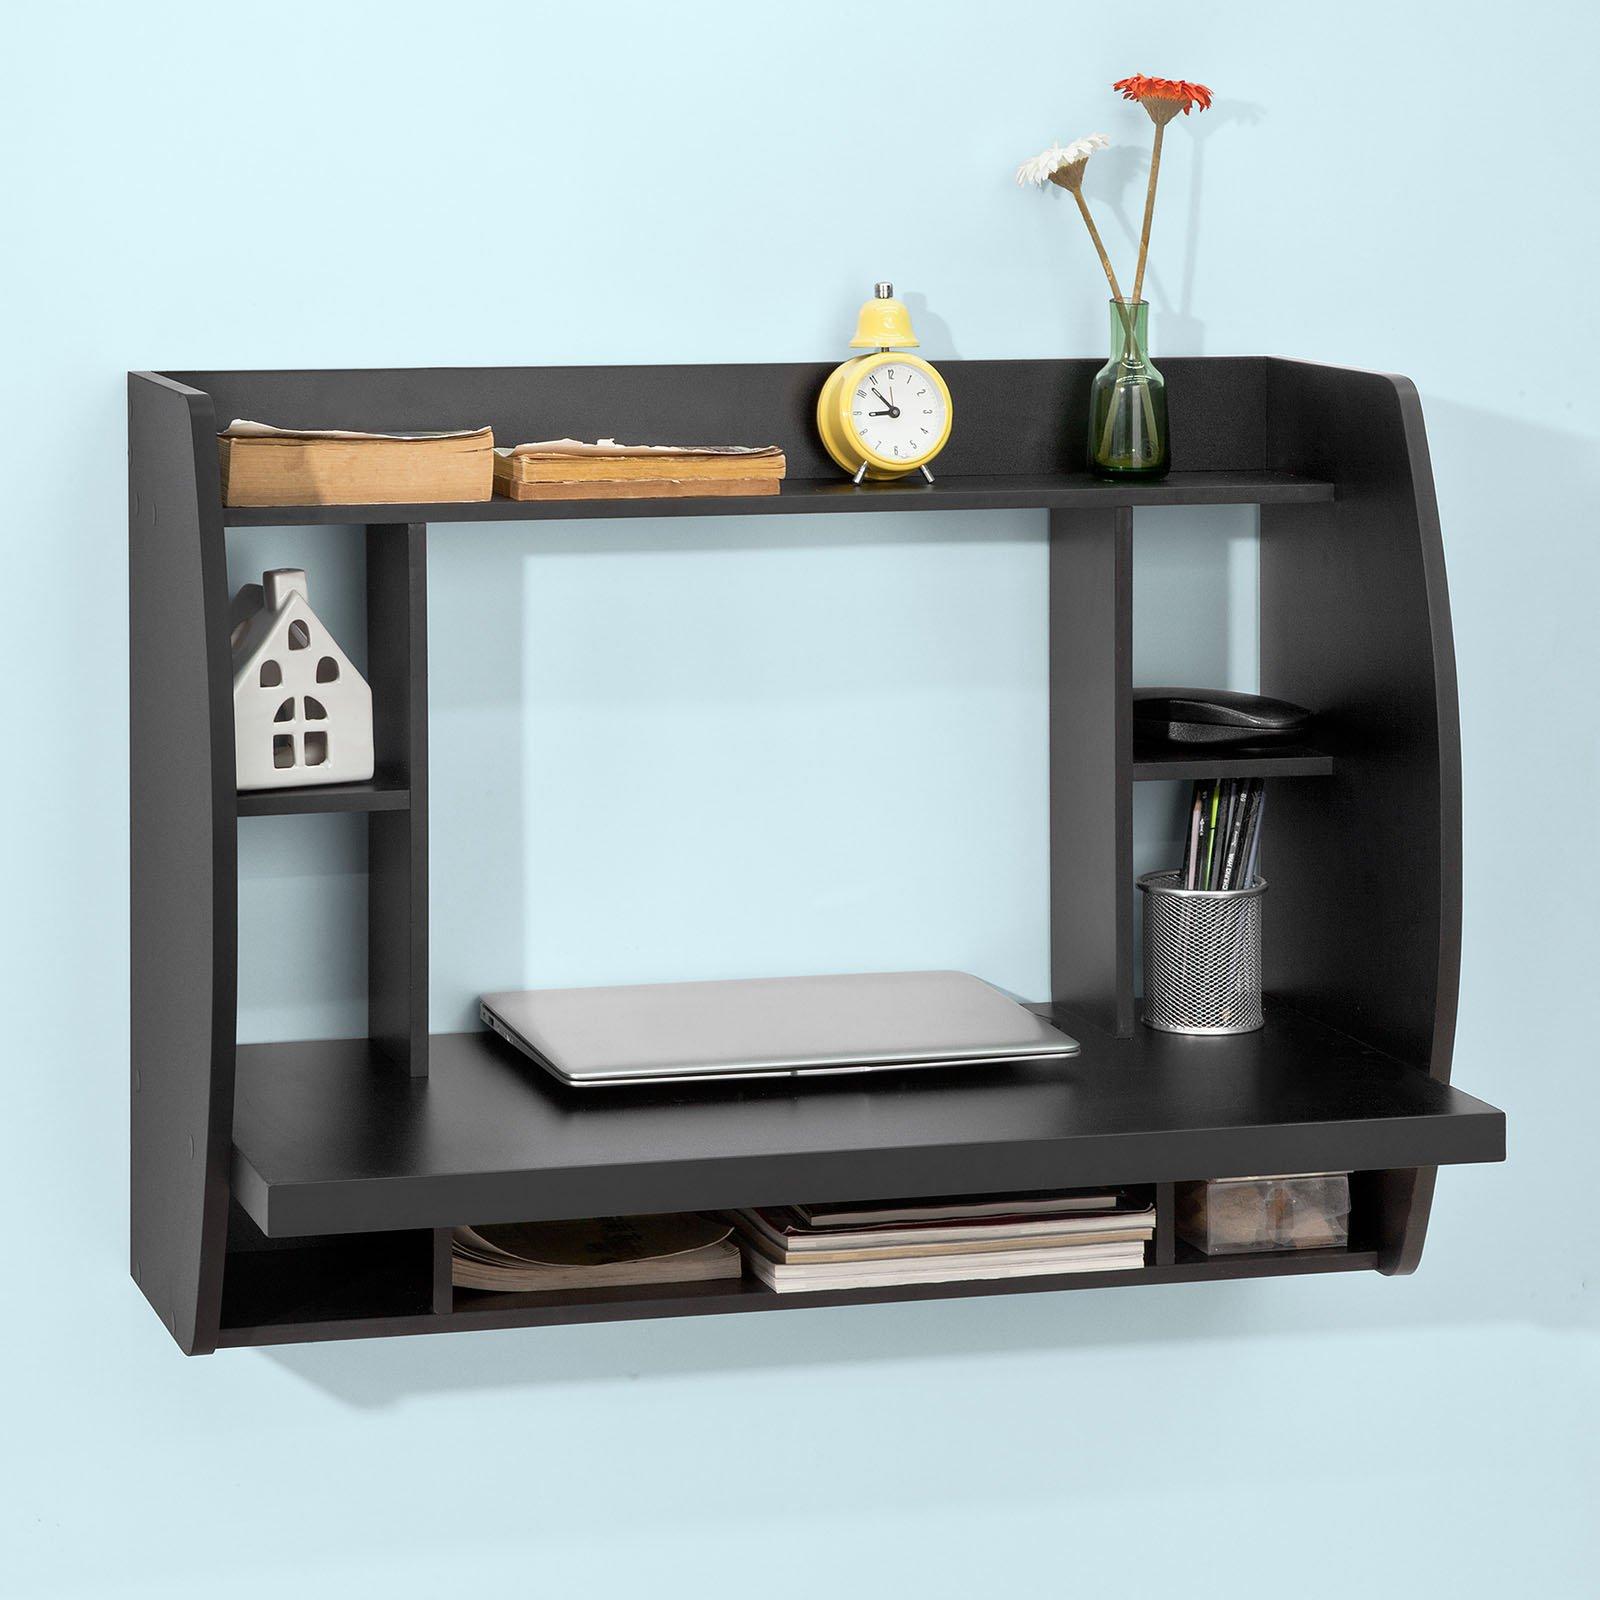 Haotian FWT18-SCH,Drop-Leaf Table Desk, Wood Children Table,Home Office Table Desk Workstation Computer Desk with Storage Shelves, Trestle Desk by Haotian